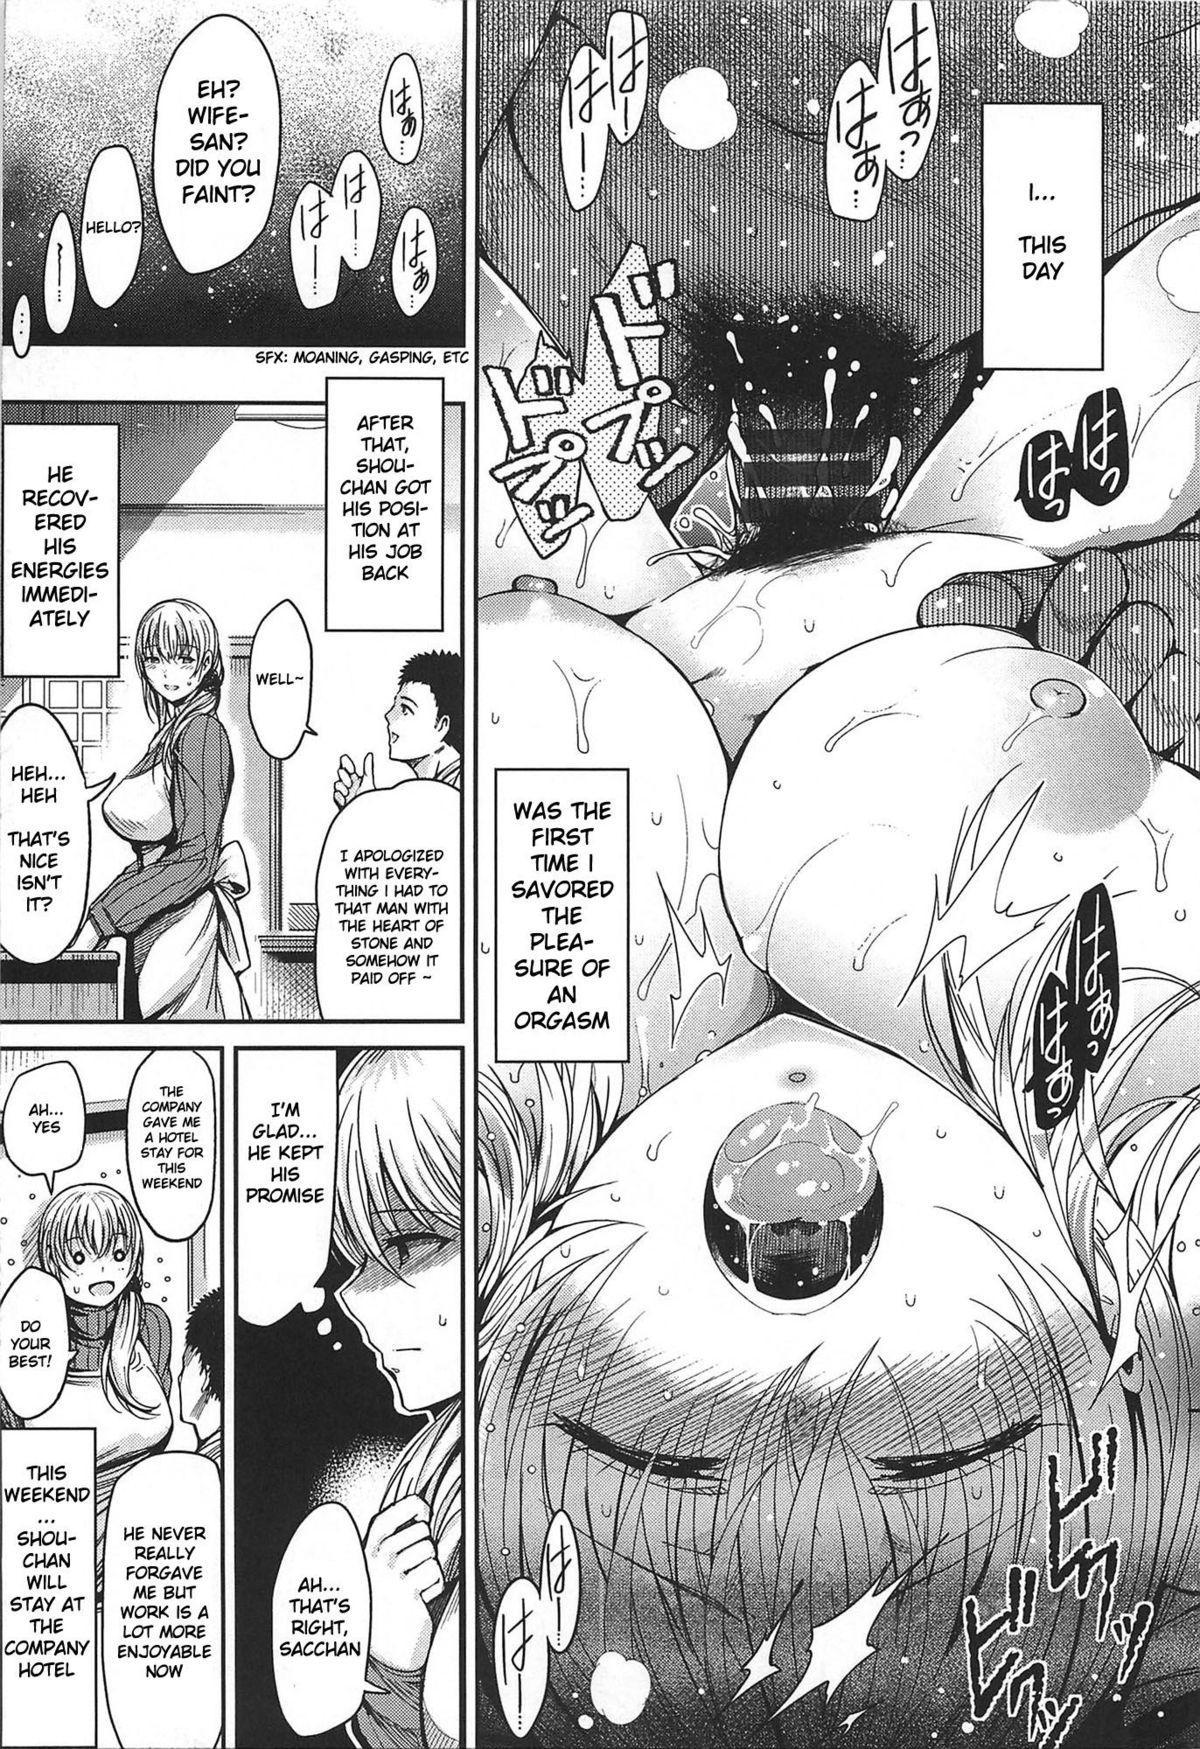 [Ichimatsu] [For my Husband's Sake] 14